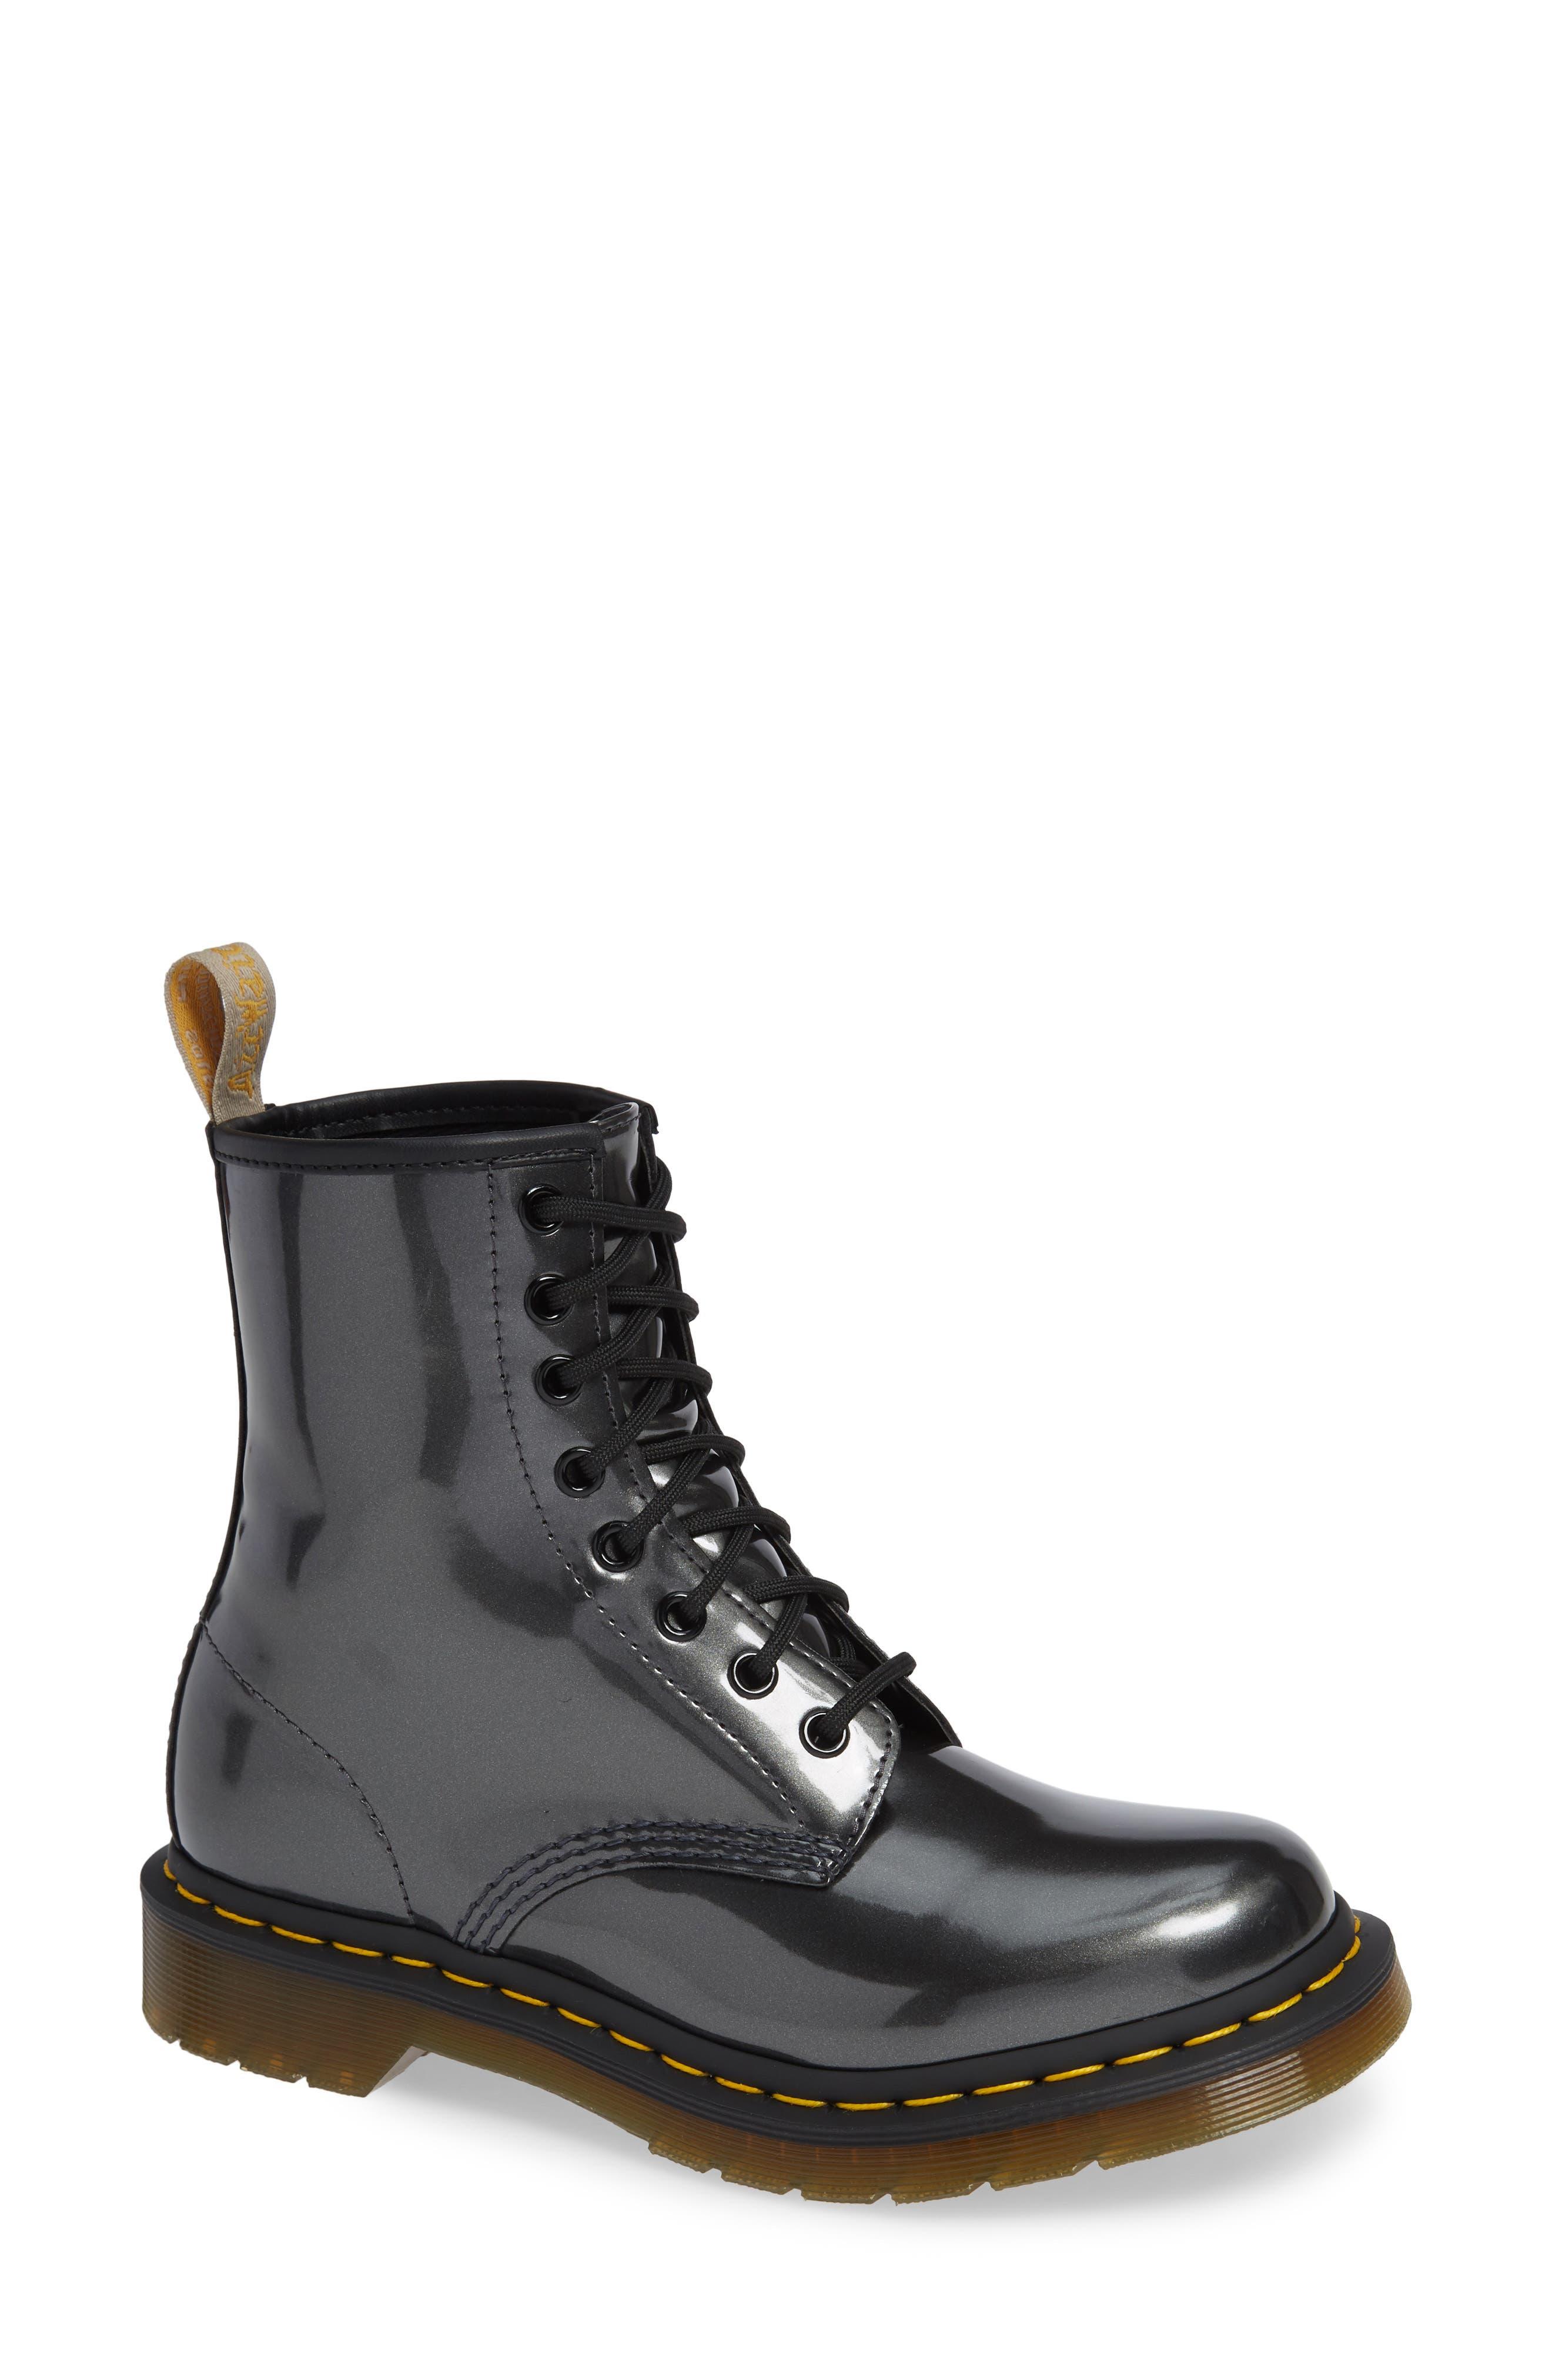 Dr. Martens 1460 Chrome Boot, Metallic